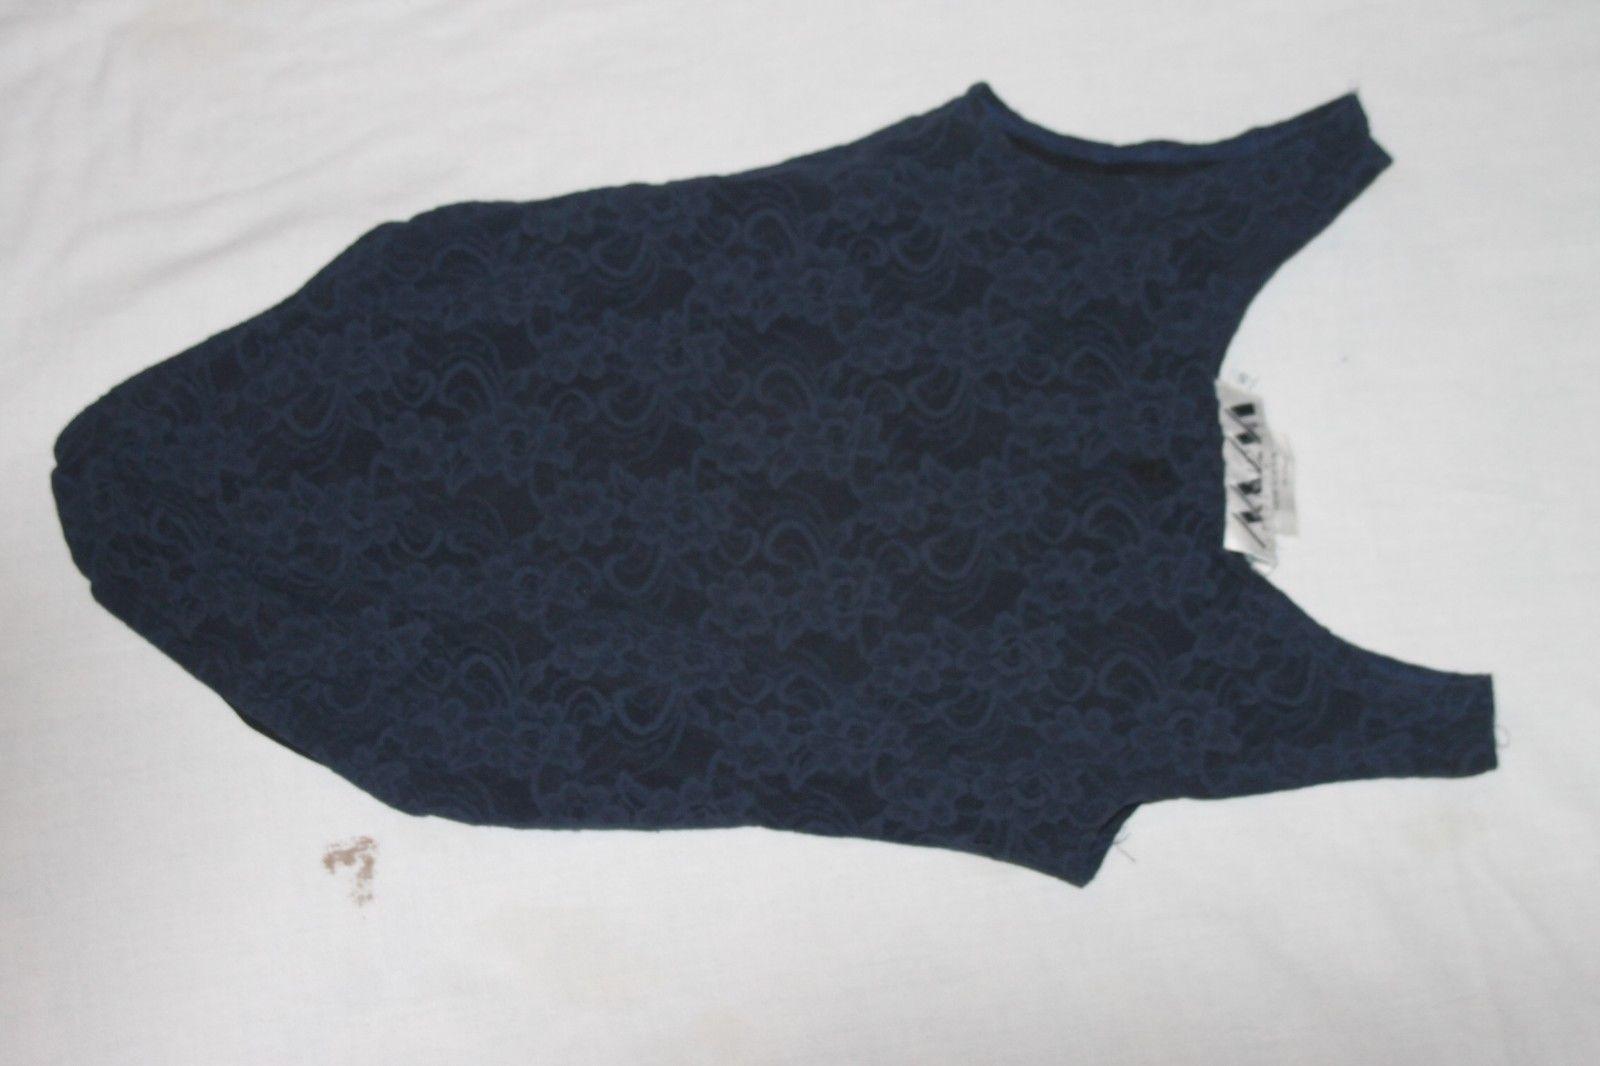 Vintage Sheer NAVY Top Mesh Lace Bodysuit Romper Snap Teddy Size S Body Suit